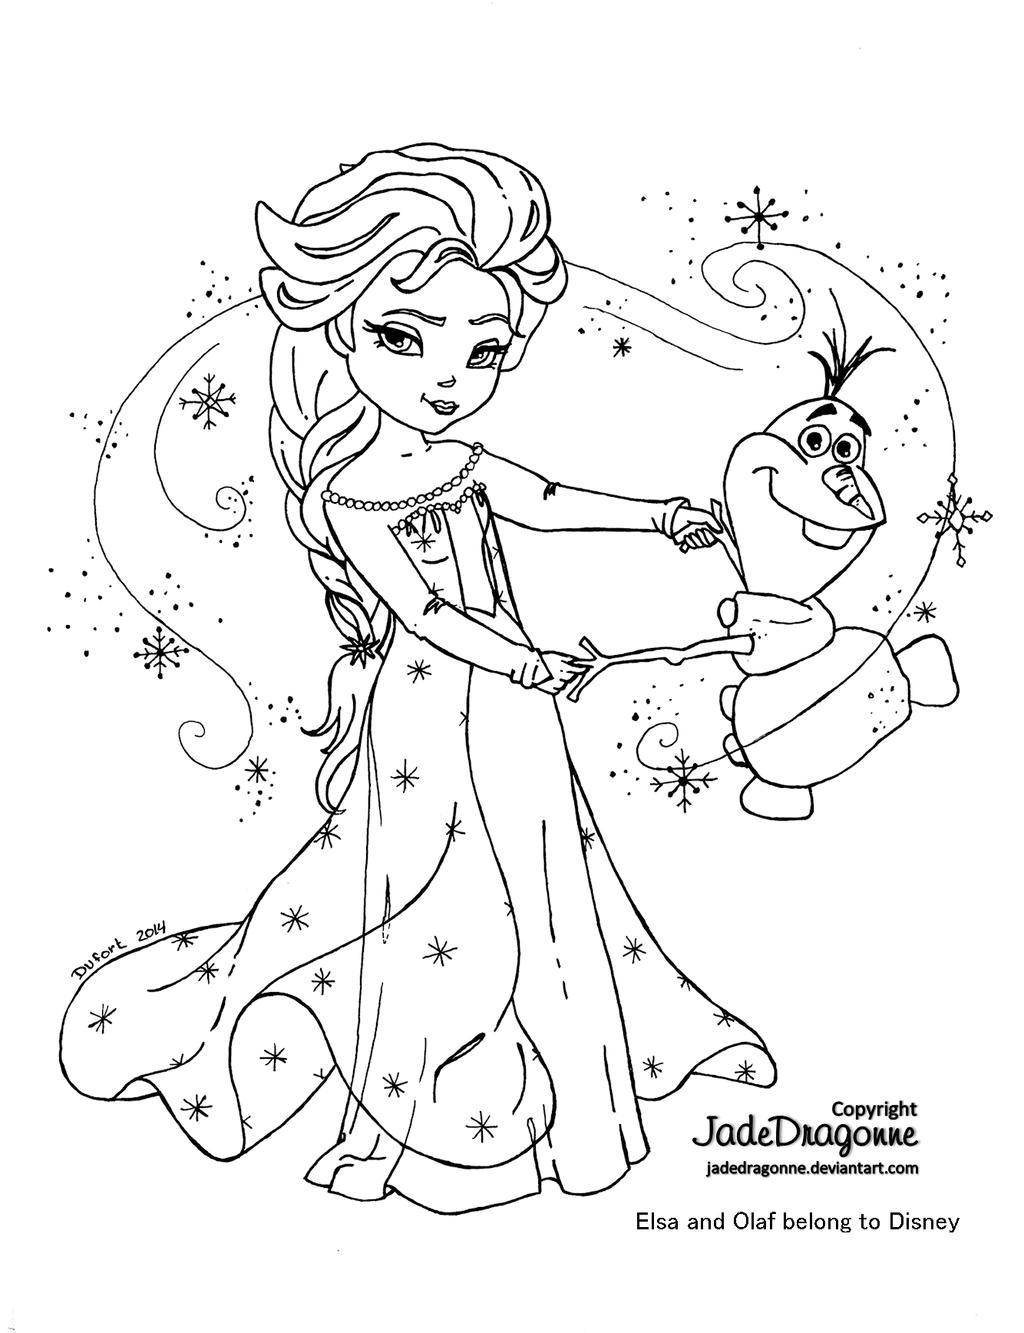 Elsa and Olaf - Lineart by JadeDragonne.deviantart.com on ...